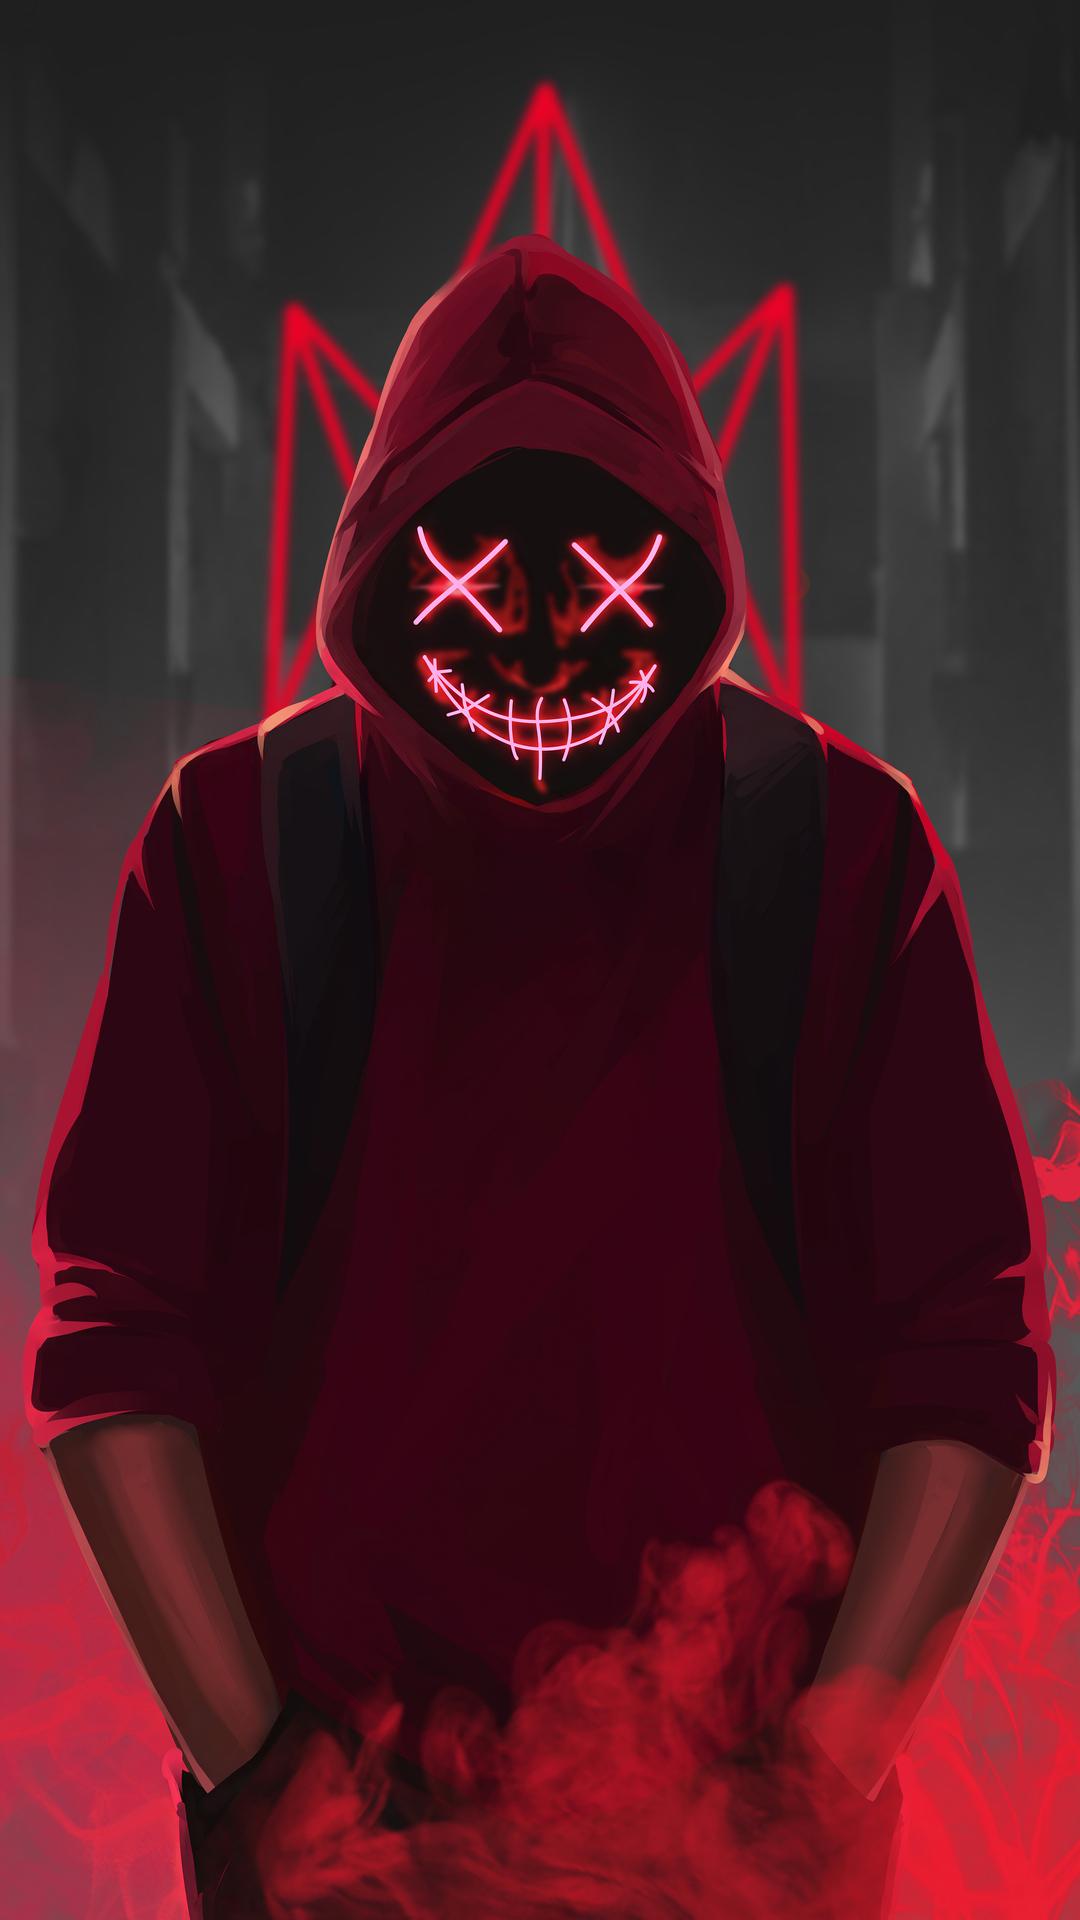 1080x1920 Red Mask Neon Eyes 4k Iphone 7,6s,6 Plus, Pixel ...